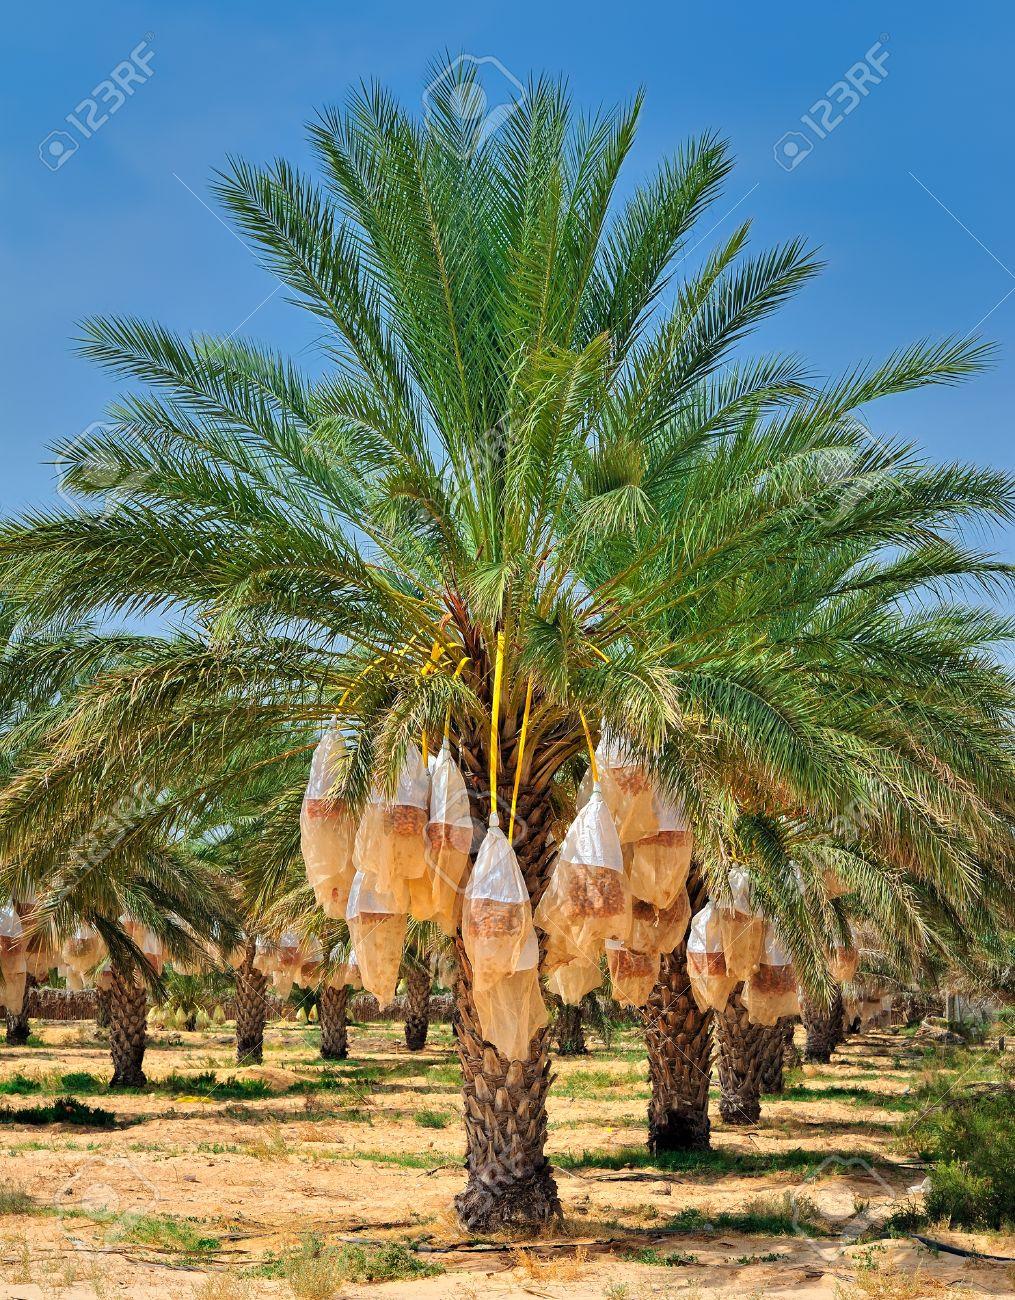 Date palm tree before harvesting. Tunisia, Africa Stock Photo - 10823509